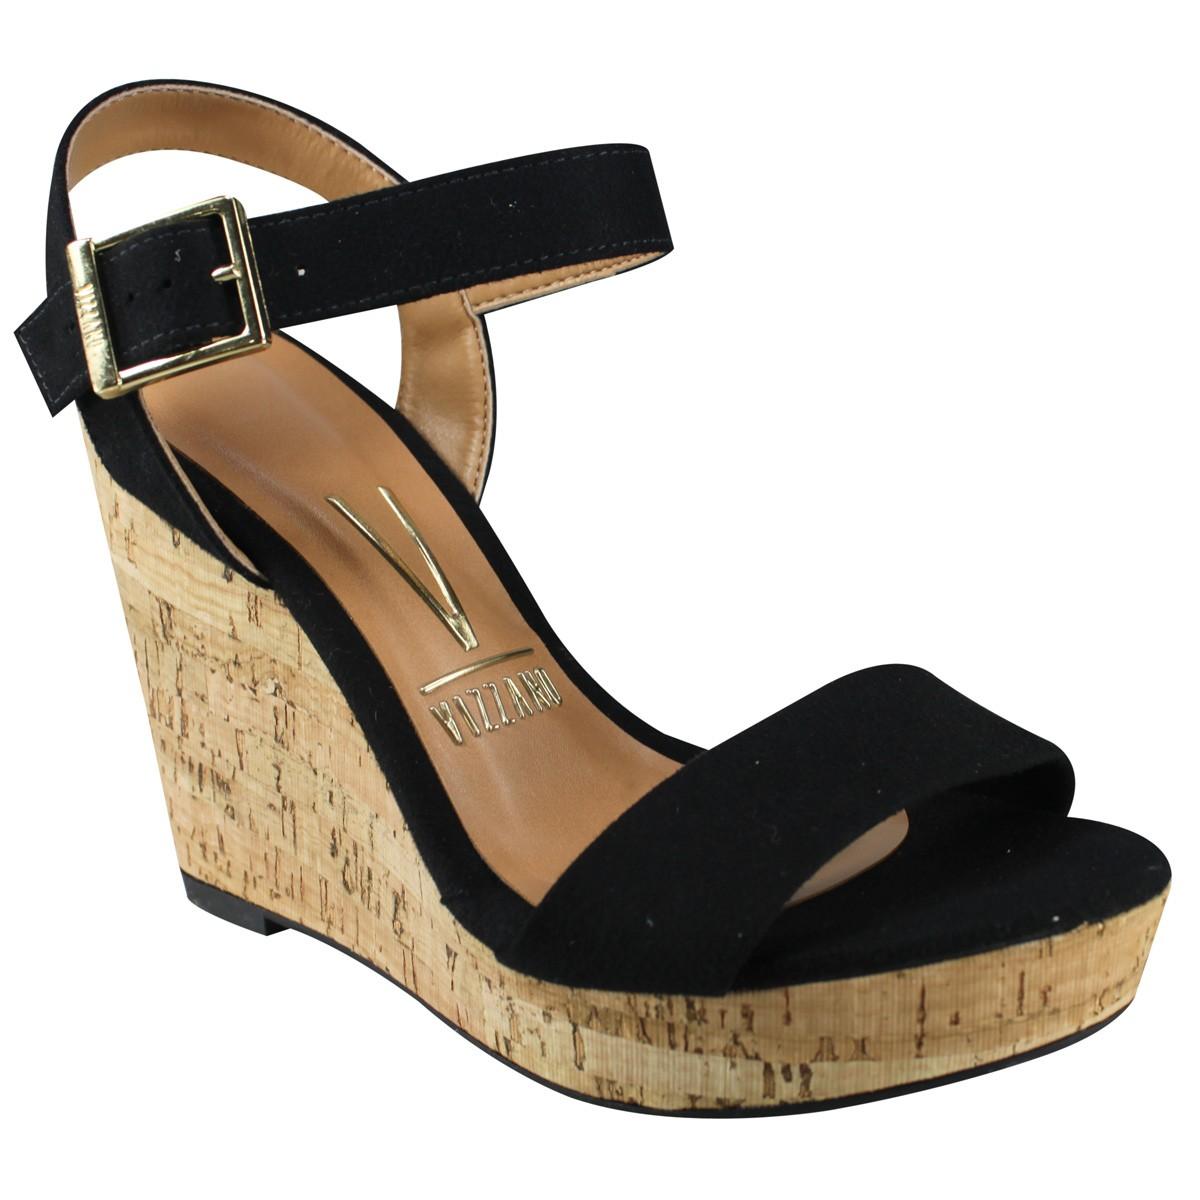 Calçados Sandálias Feminino Vizzano Sandália Plataforma Vizzano